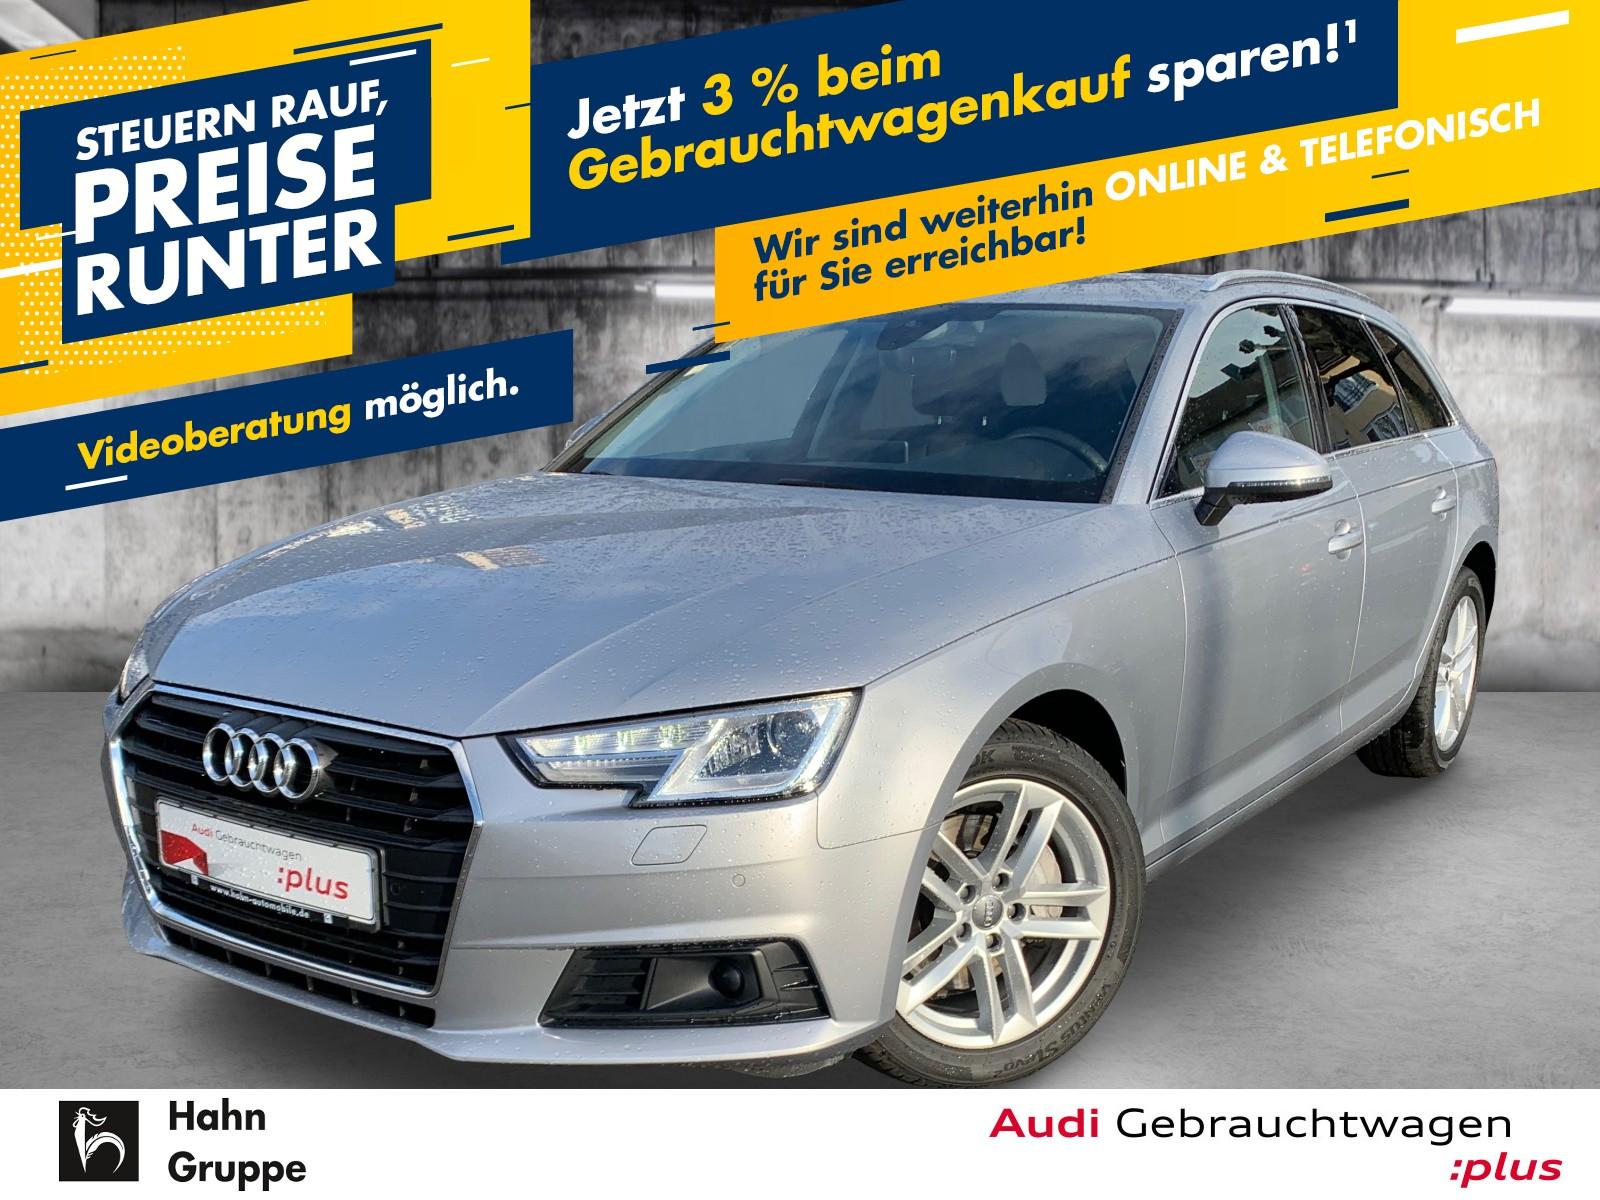 Audi A4 Avant 2.0TDI S-trc Navi Xen Sitzh Einpark, Jahr 2017, Diesel